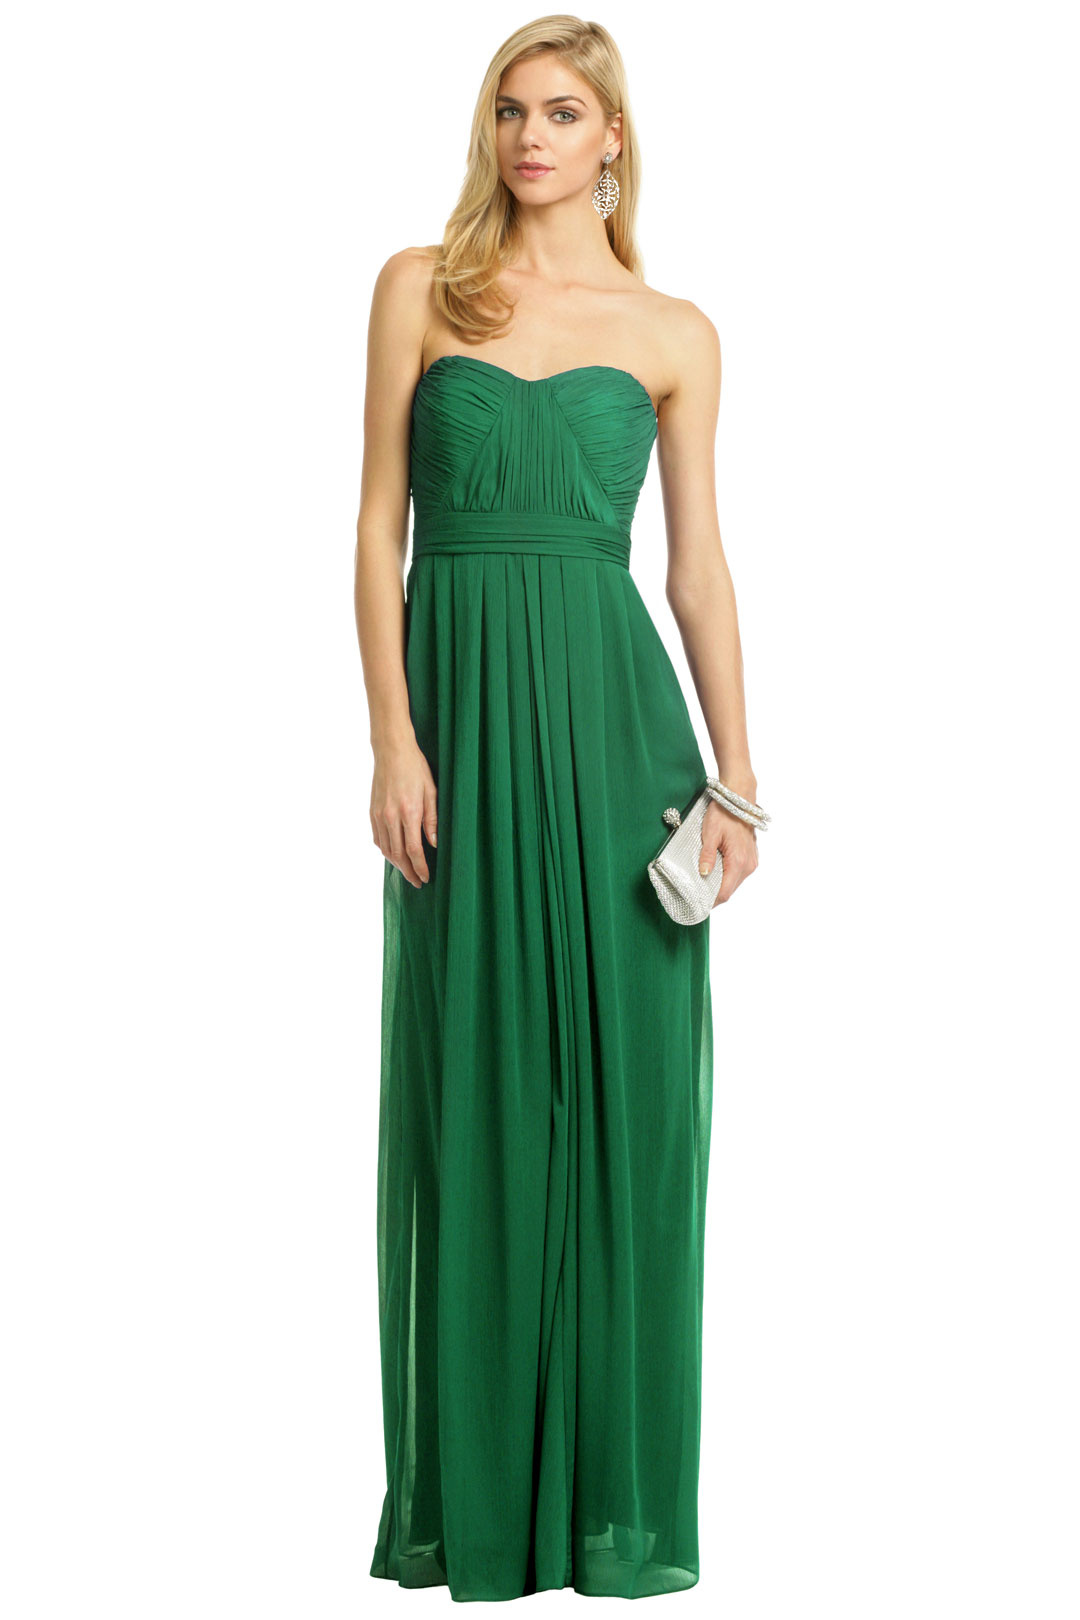 Rent the Runway - Badgley Mischka Flora Chiffon Gown